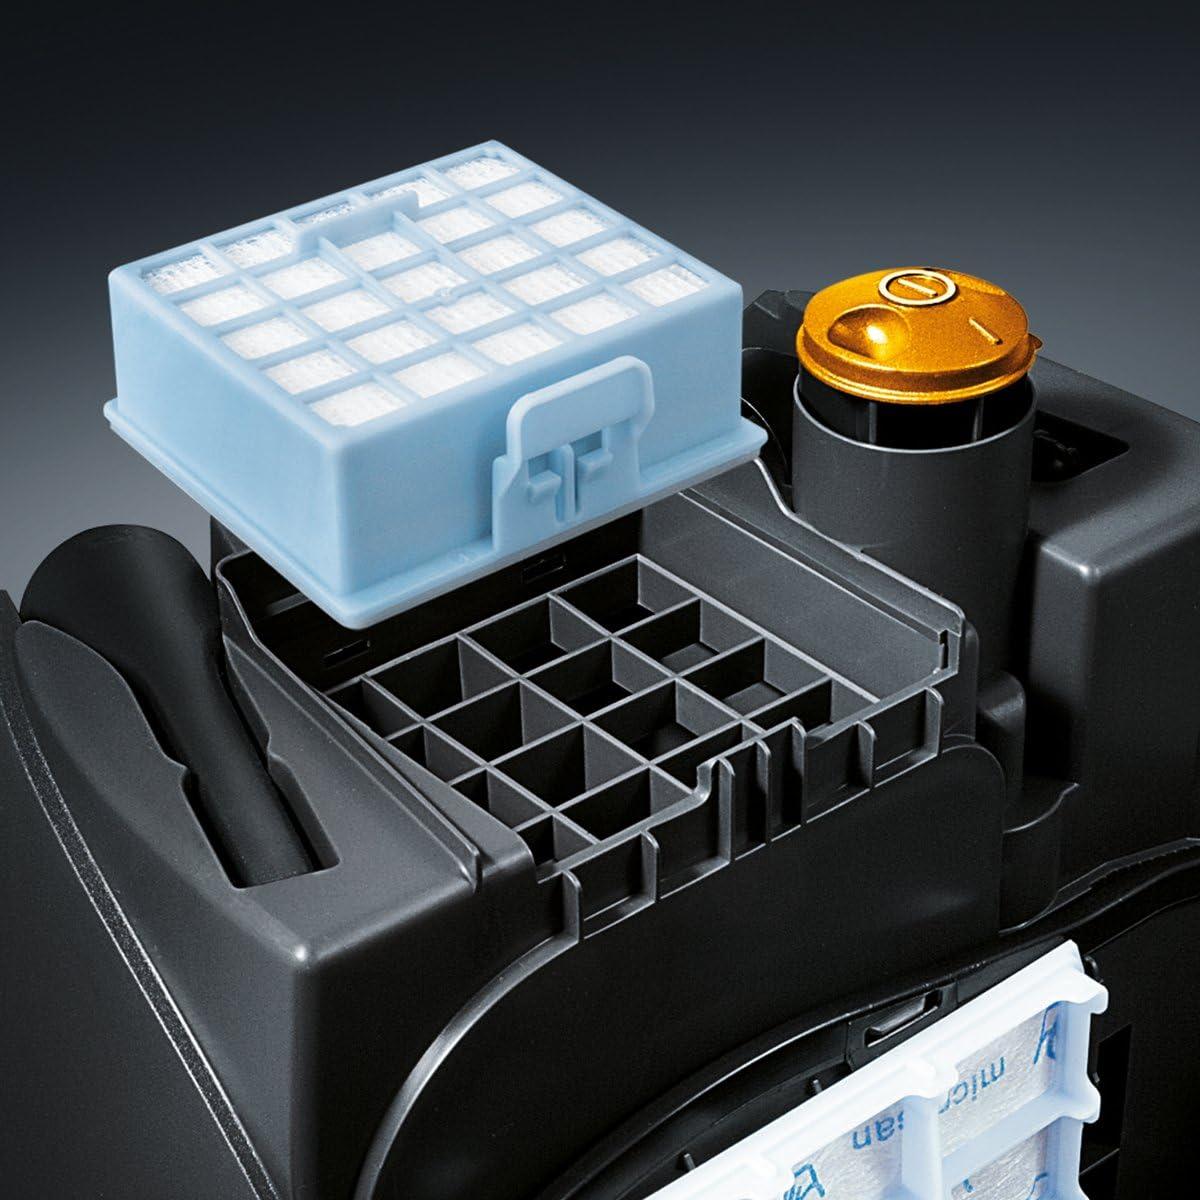 SET Filtro del motor Filtro HEPA 10 Bolsas de aspiradora Para SIEMENS Power Edition VSZ32411//03 Z3.0 VSZ32412//03 Z3.0 VSZ32512//03 Z3.0